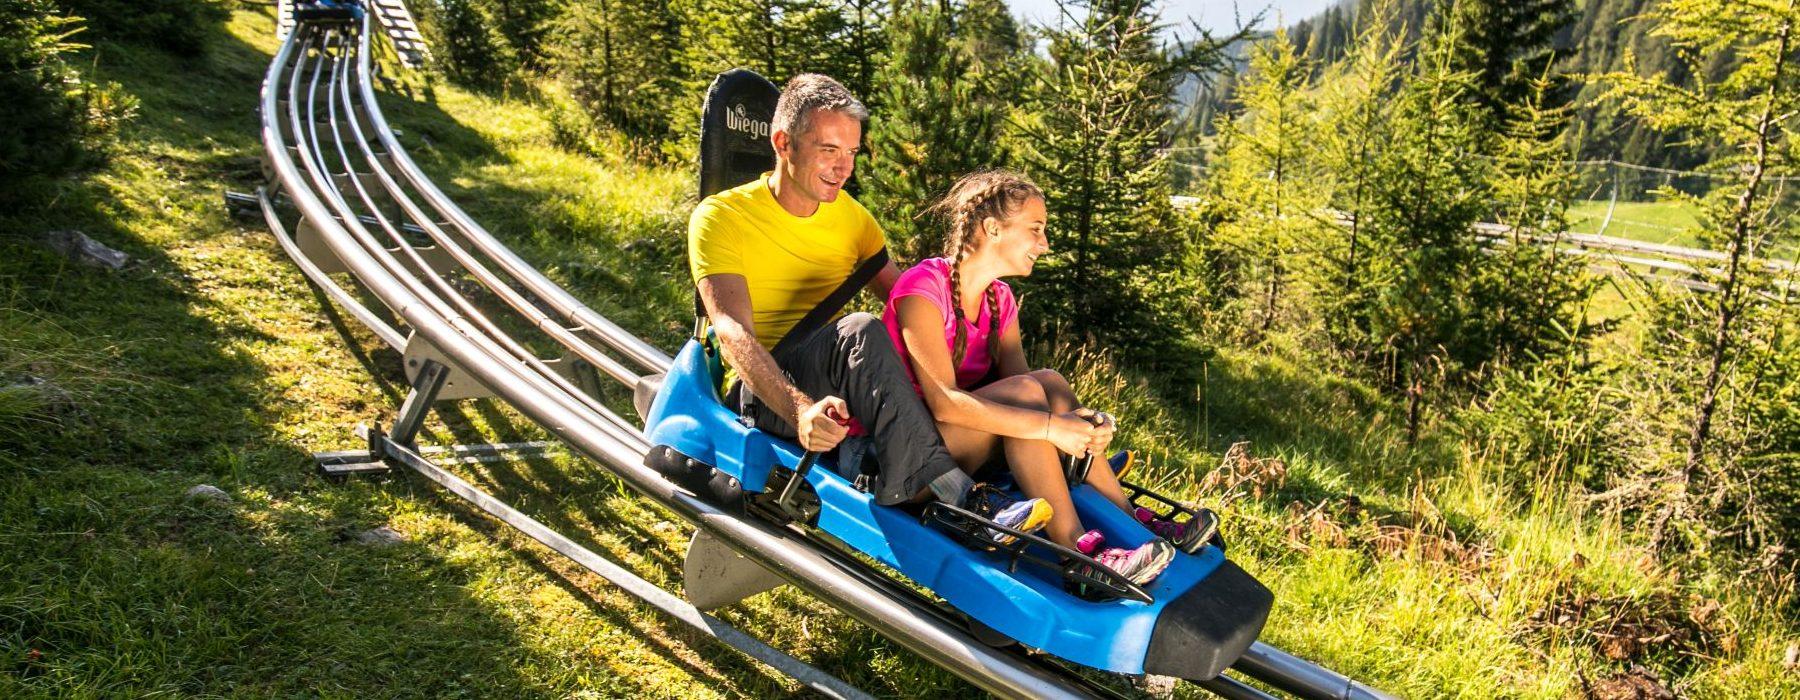 alpine-coaster-gardonè-latemar-trentino-val-di-fiemme